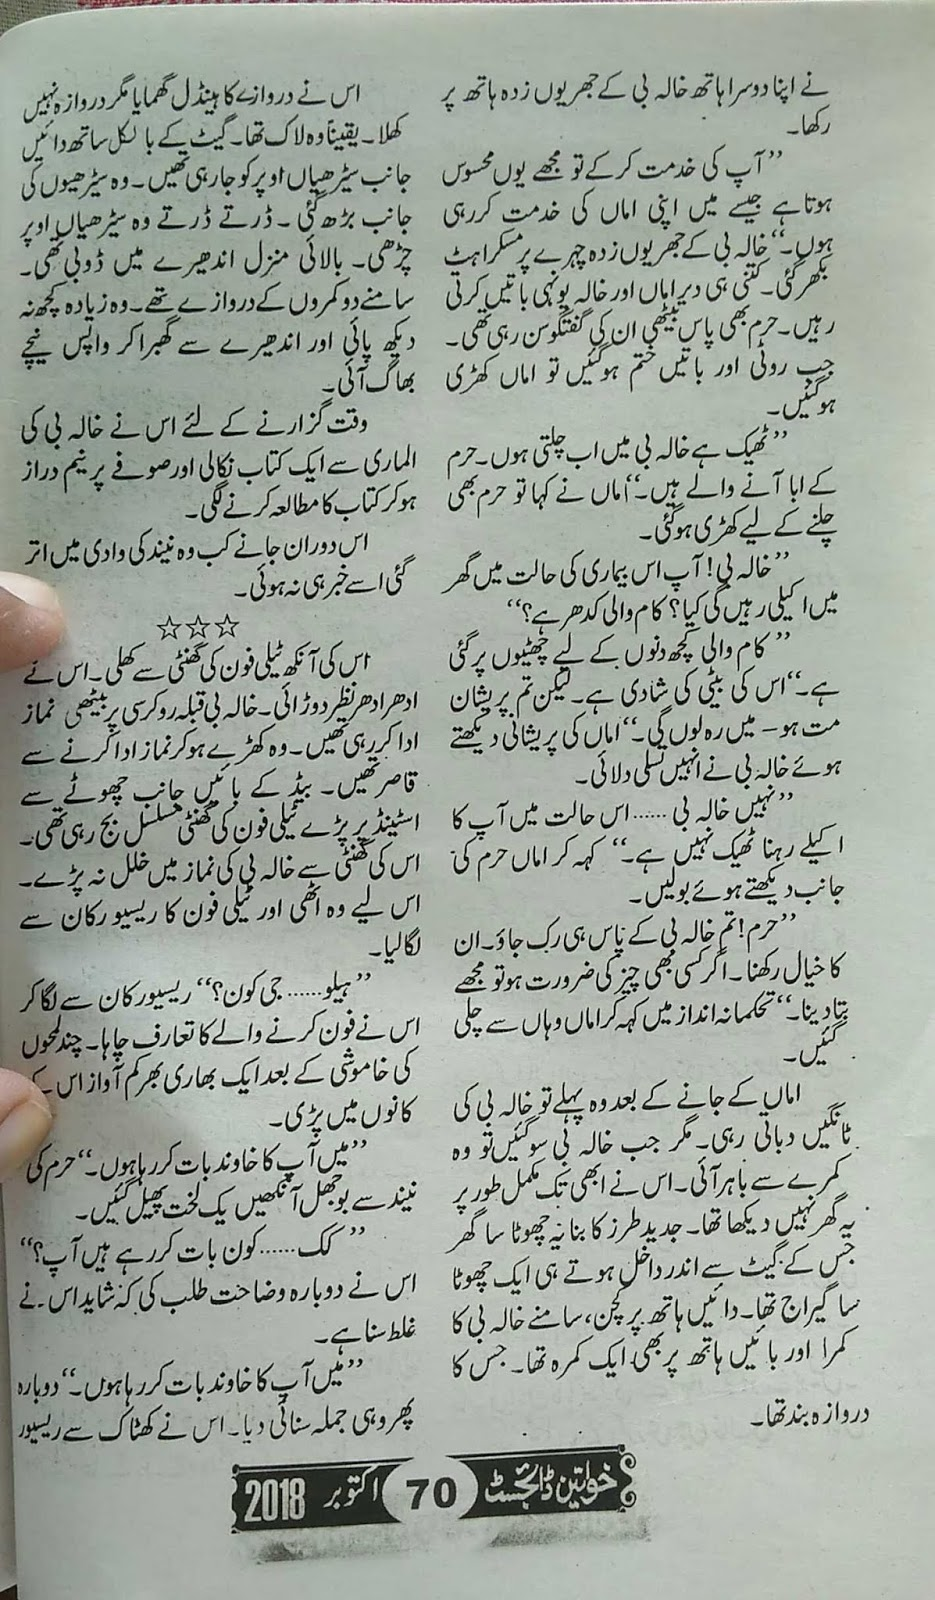 Image Of Most Romance Novel In Urdu TUM NE IQRAR MANGA HAI ROMANTIC